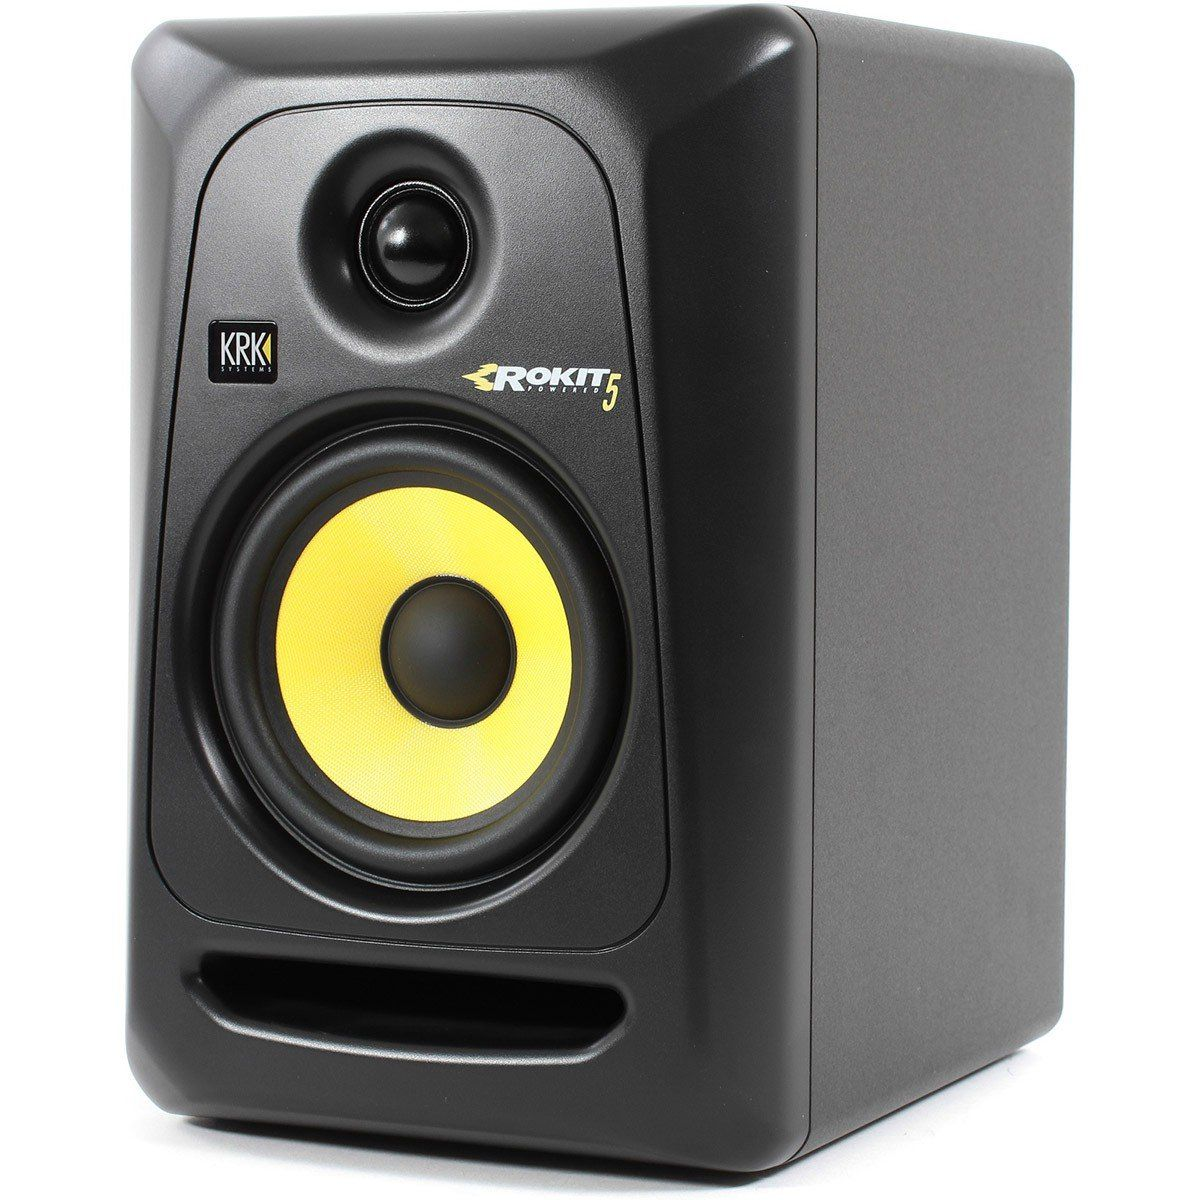 Usado - KRK RP5 G3 Rokit Powered Monitor de Áudio de Referencia para Estúdio